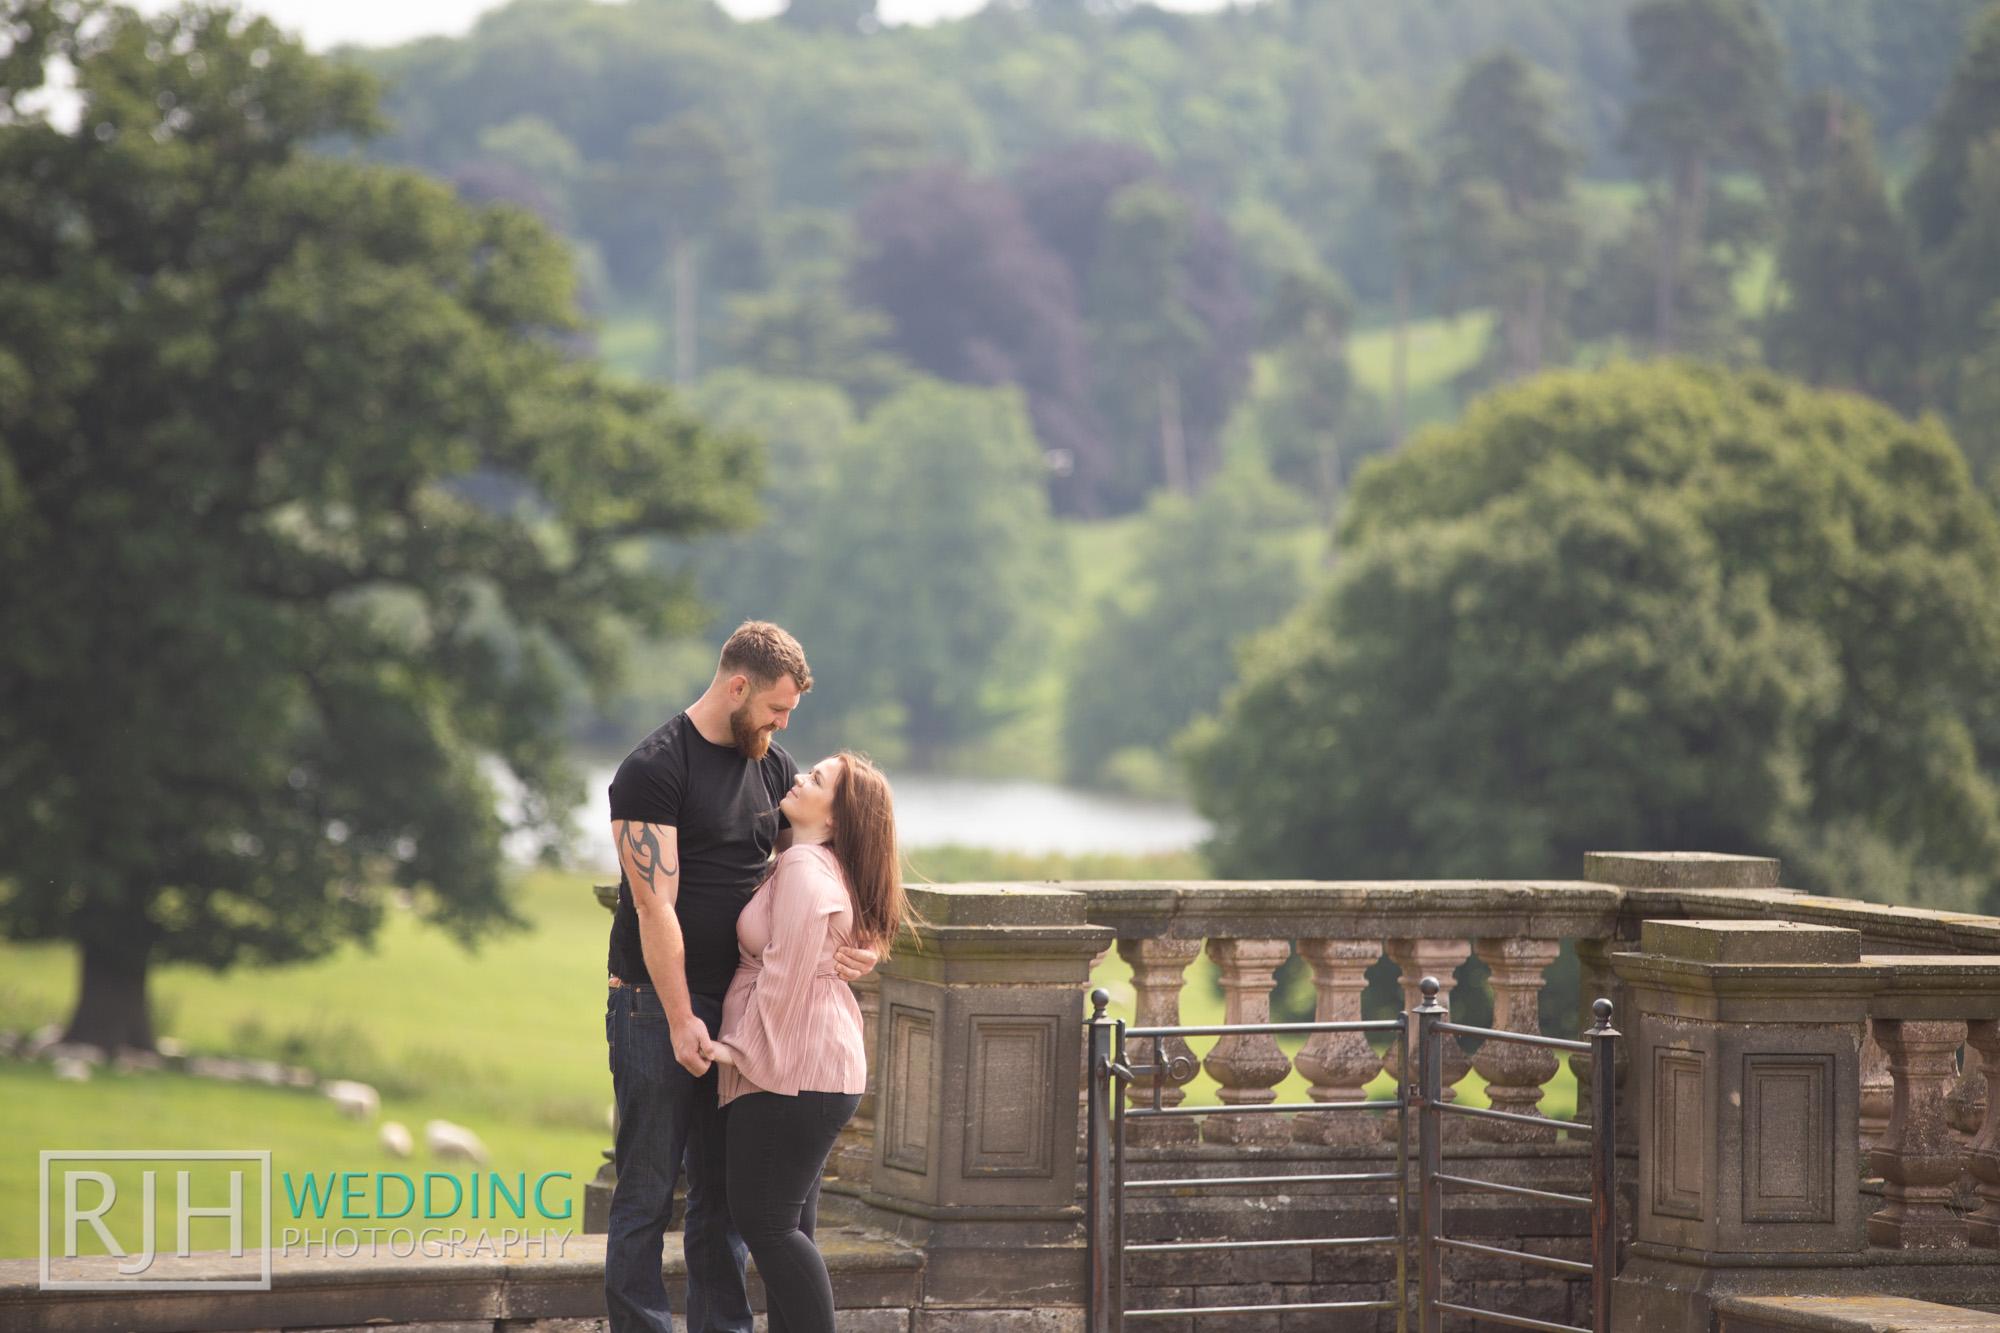 Osmaston Park Wedding Photographer - Jodie & Oli_019_IMG_7533.jpg